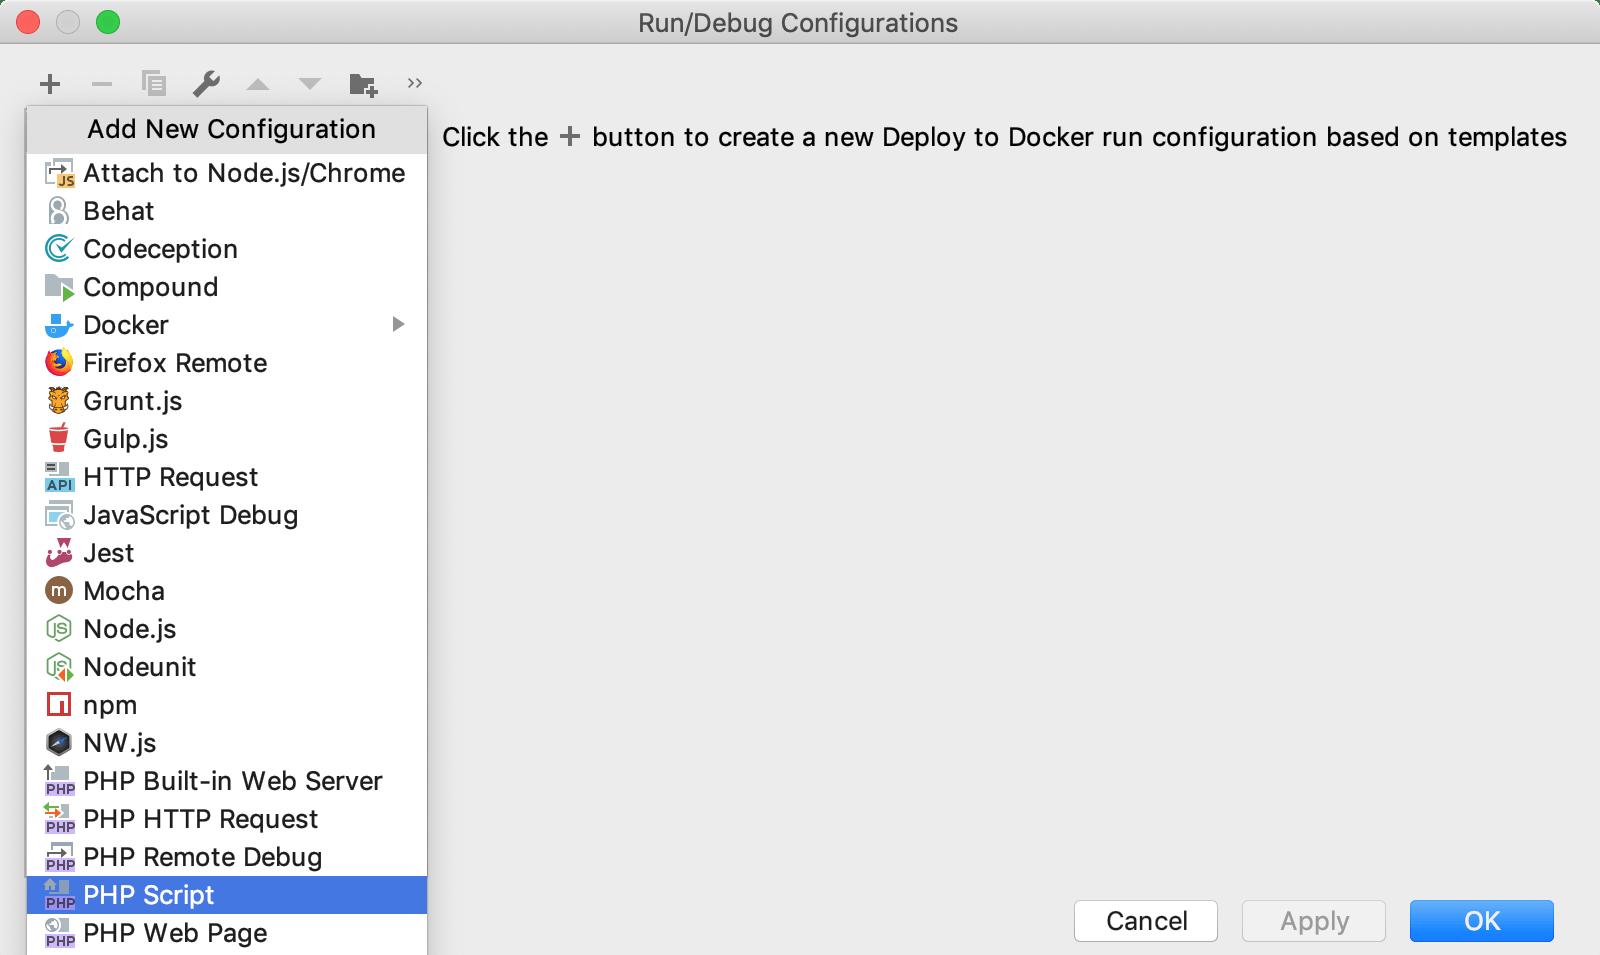 Run/Debug configuration: PHP script